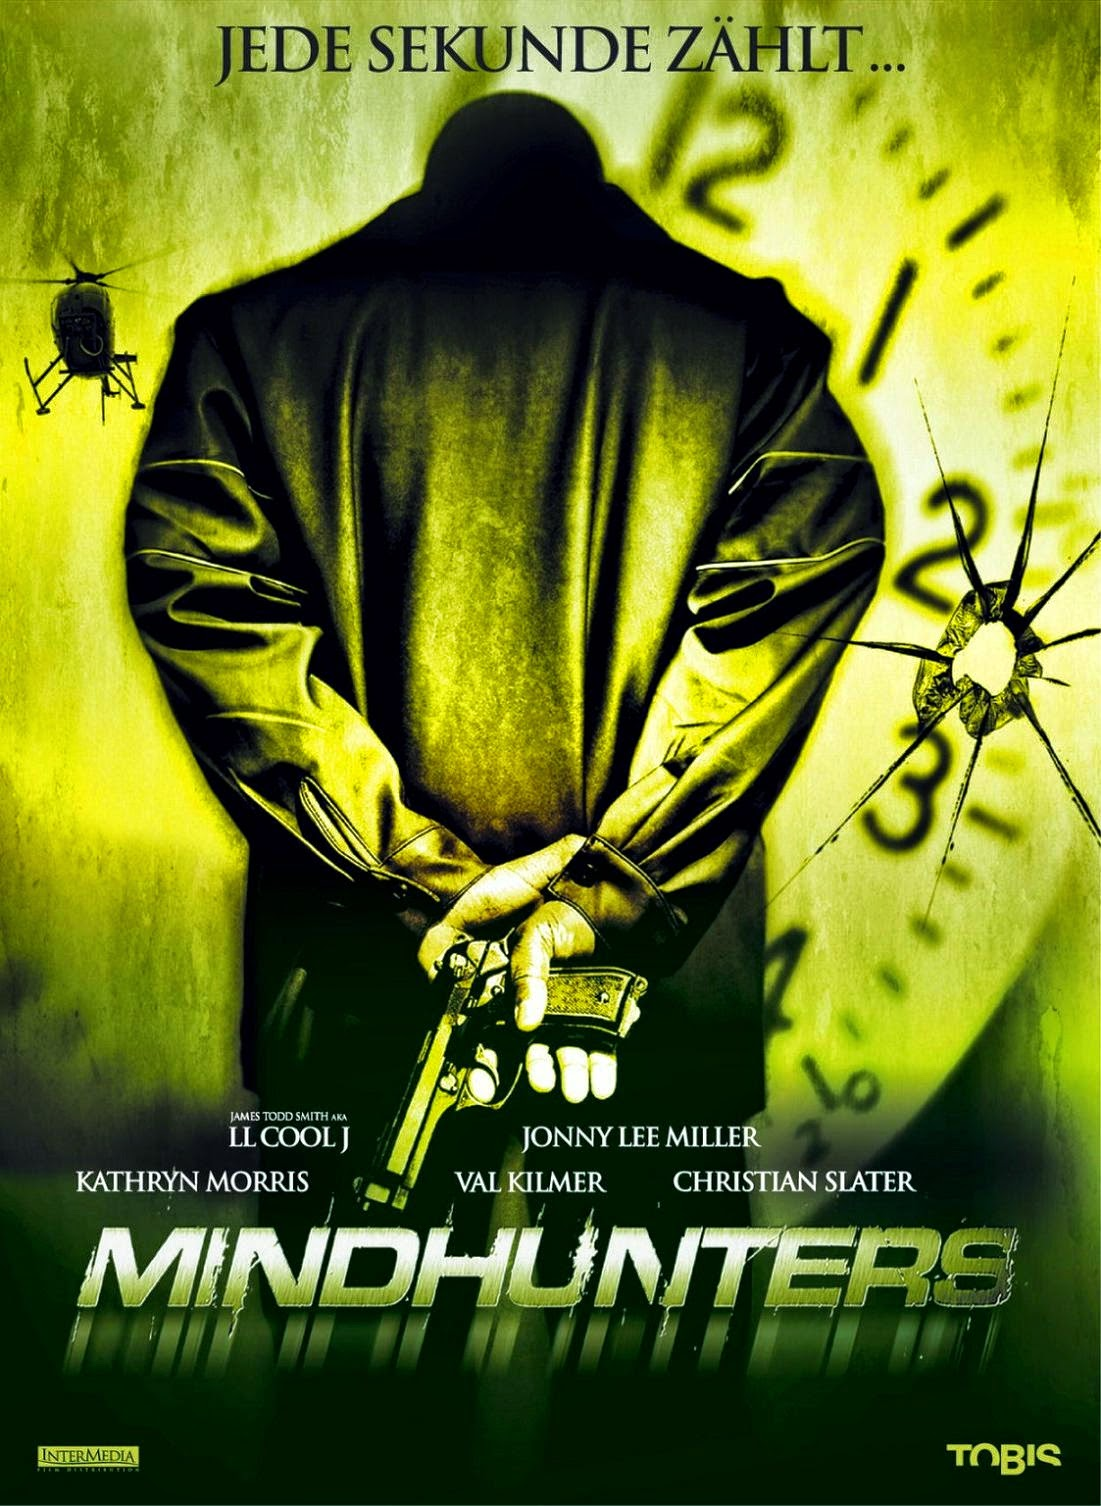 Mindhunters ตลบหลังฆ่าเกมล่าสังหาร [HD]